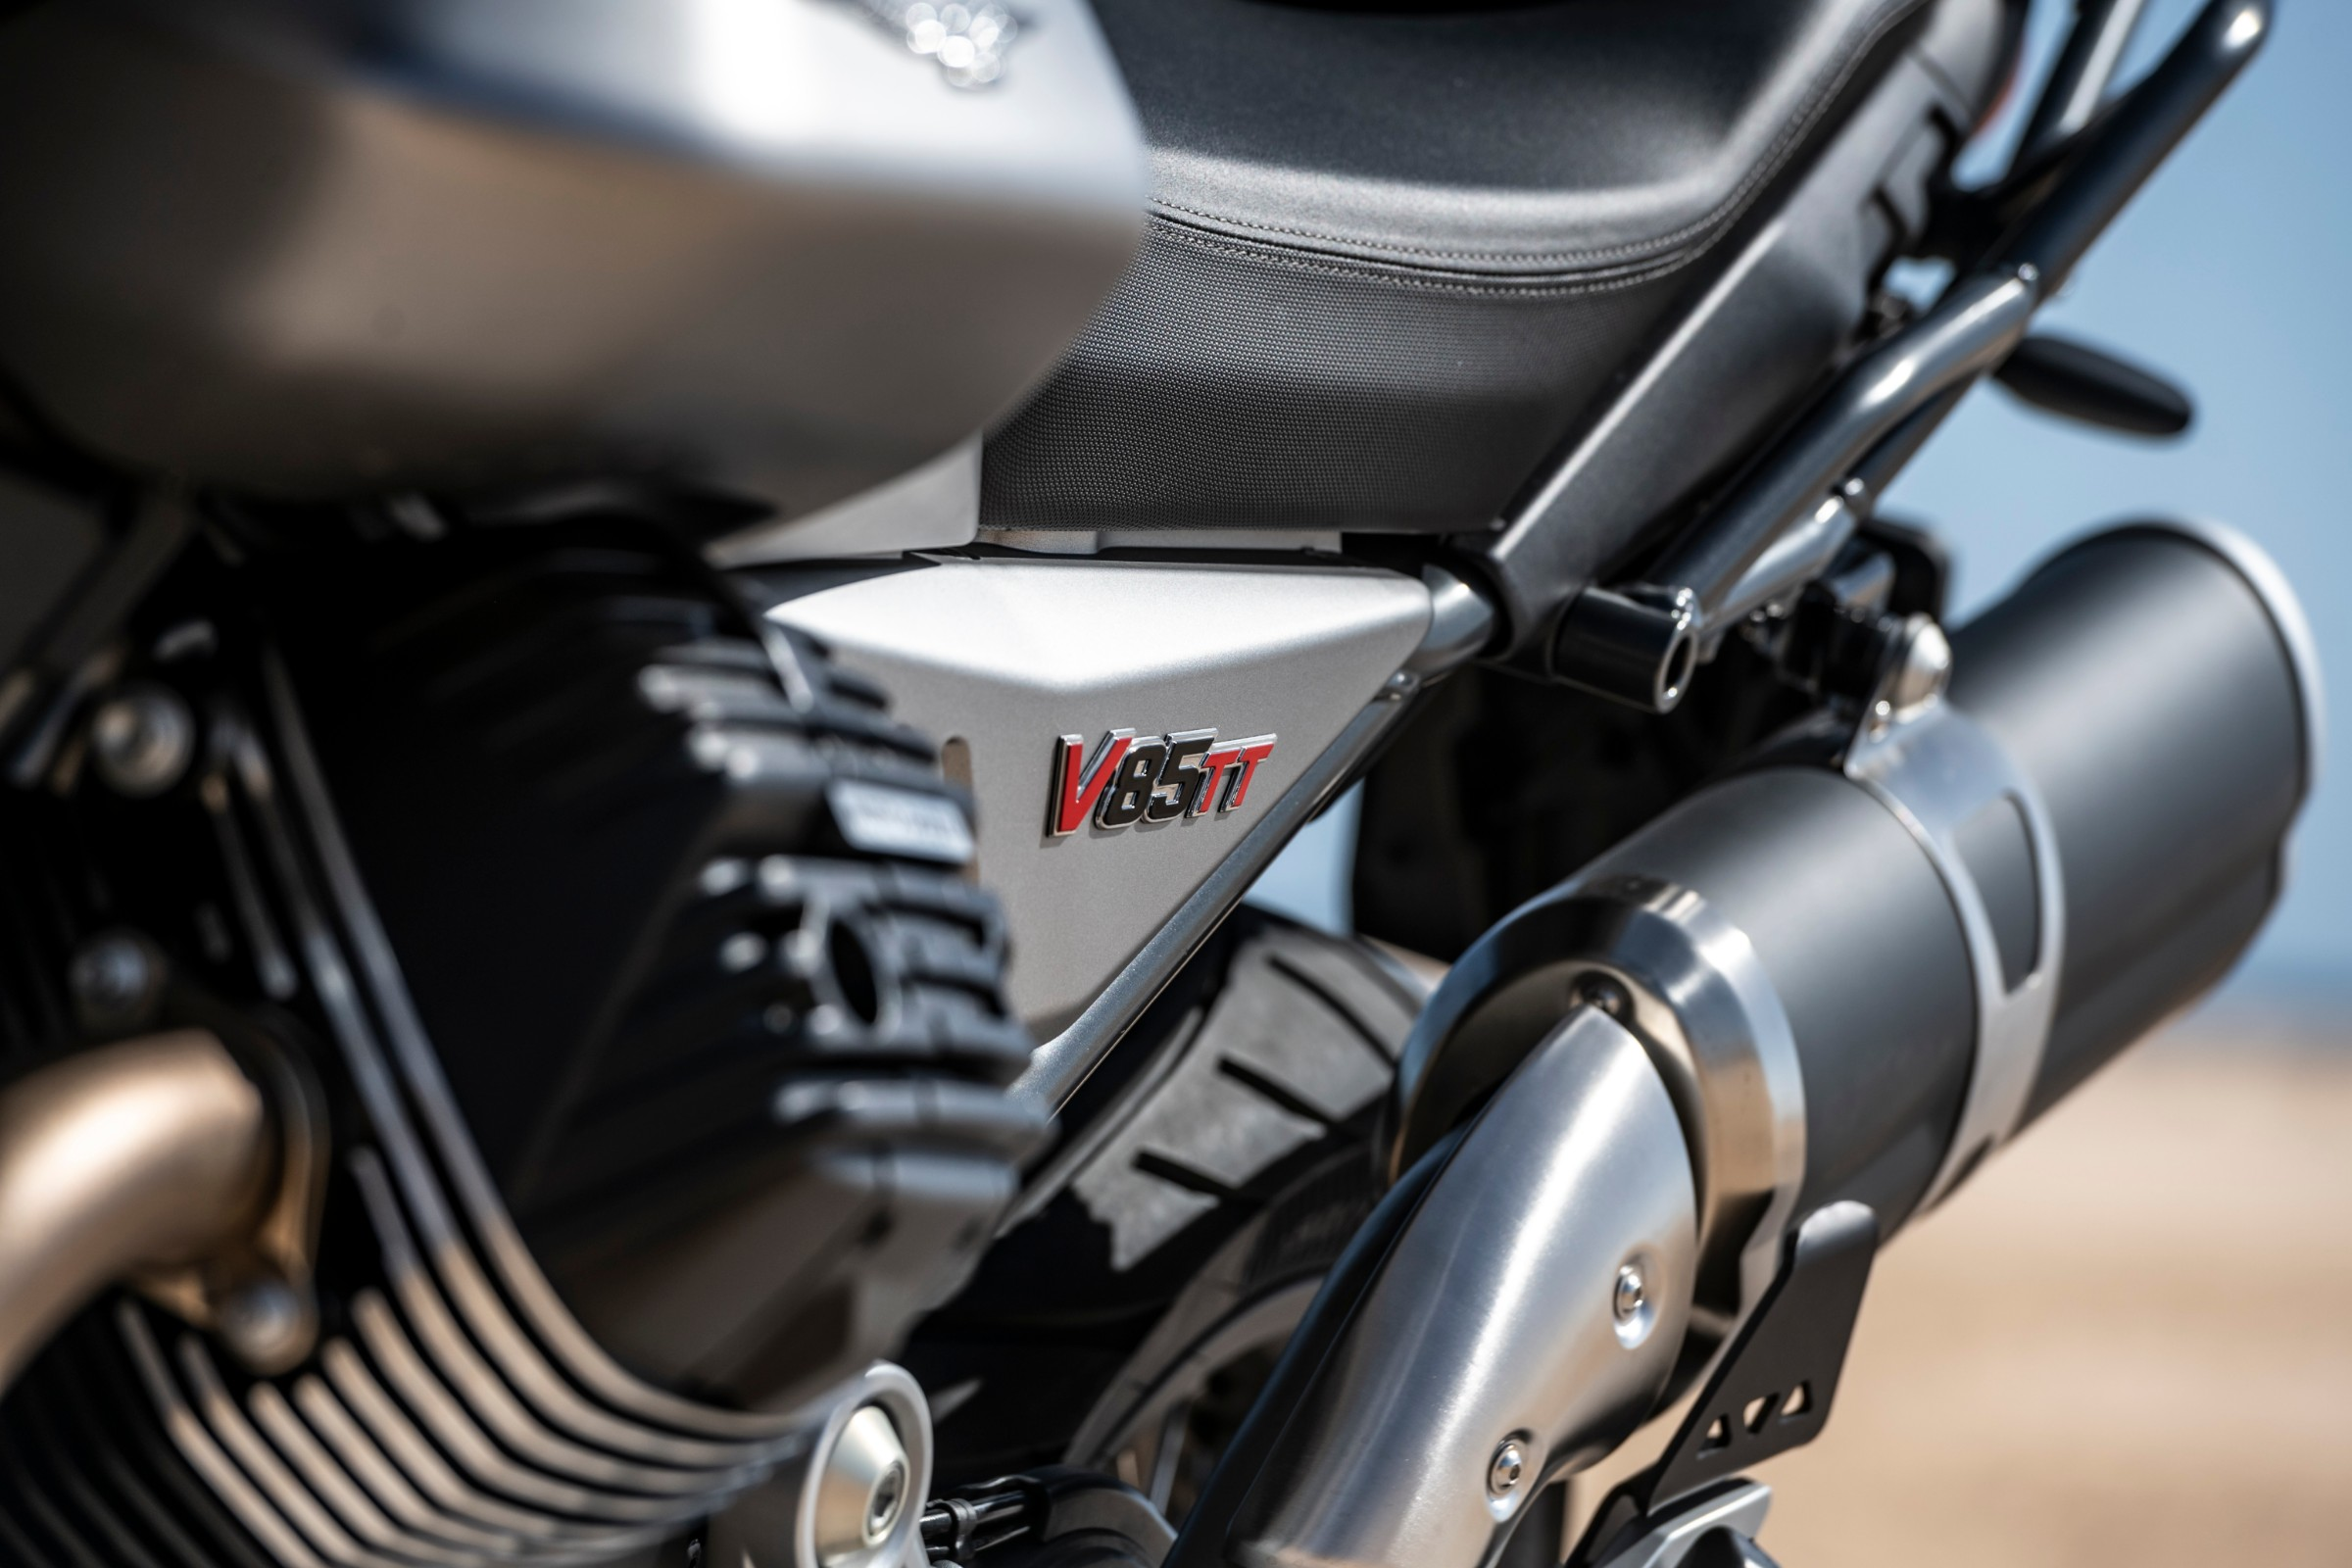 2020 Moto Guzzi V85 TT first ride review - RevZilla